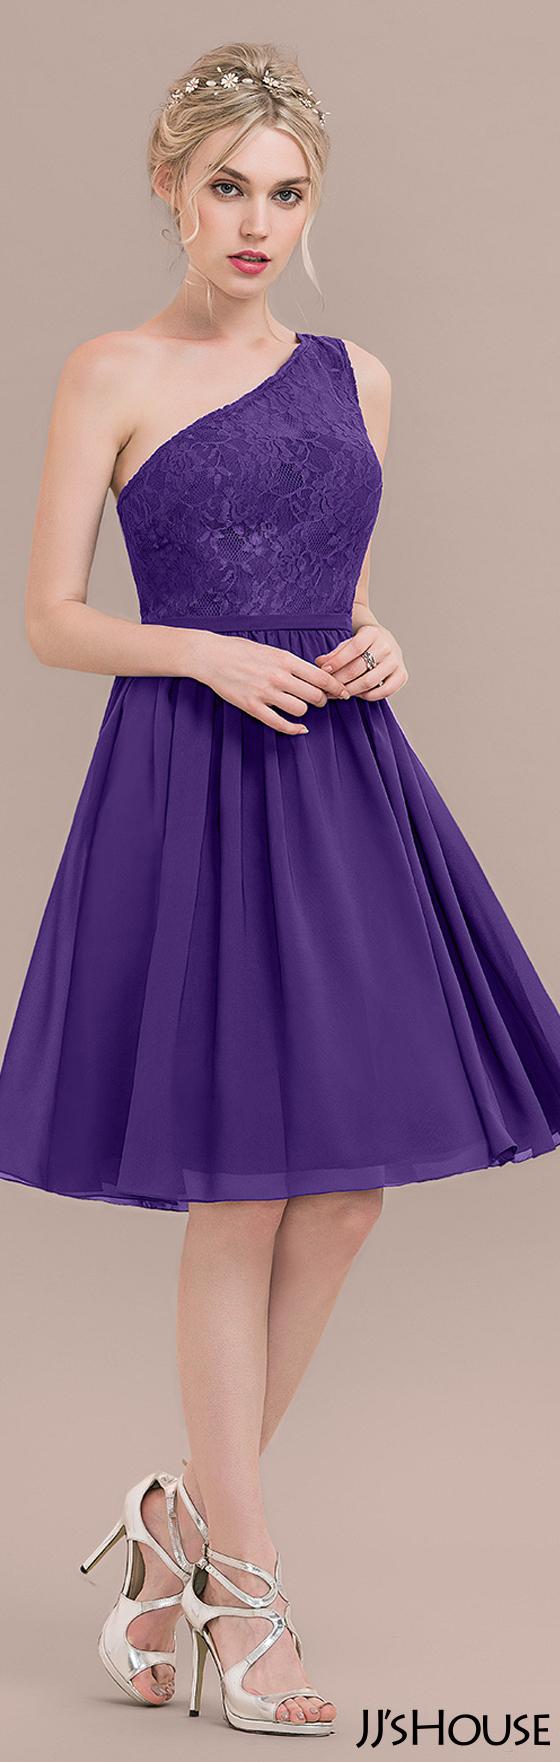 JJsHouse #Bridesmaid | MODA | Pinterest | Vestidos de dama, Vestido ...